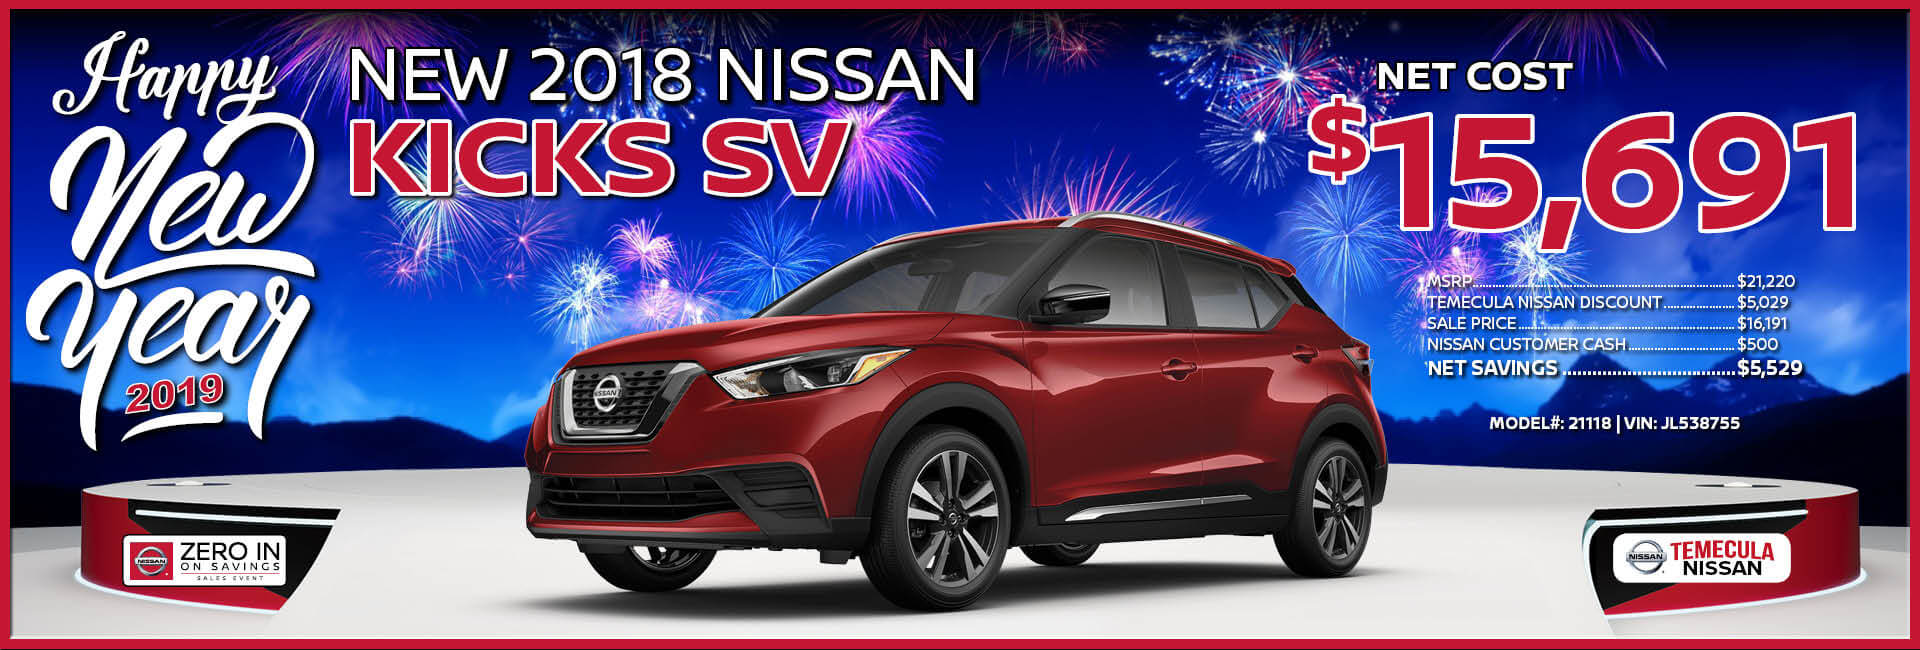 Nissan Kicks $15,691